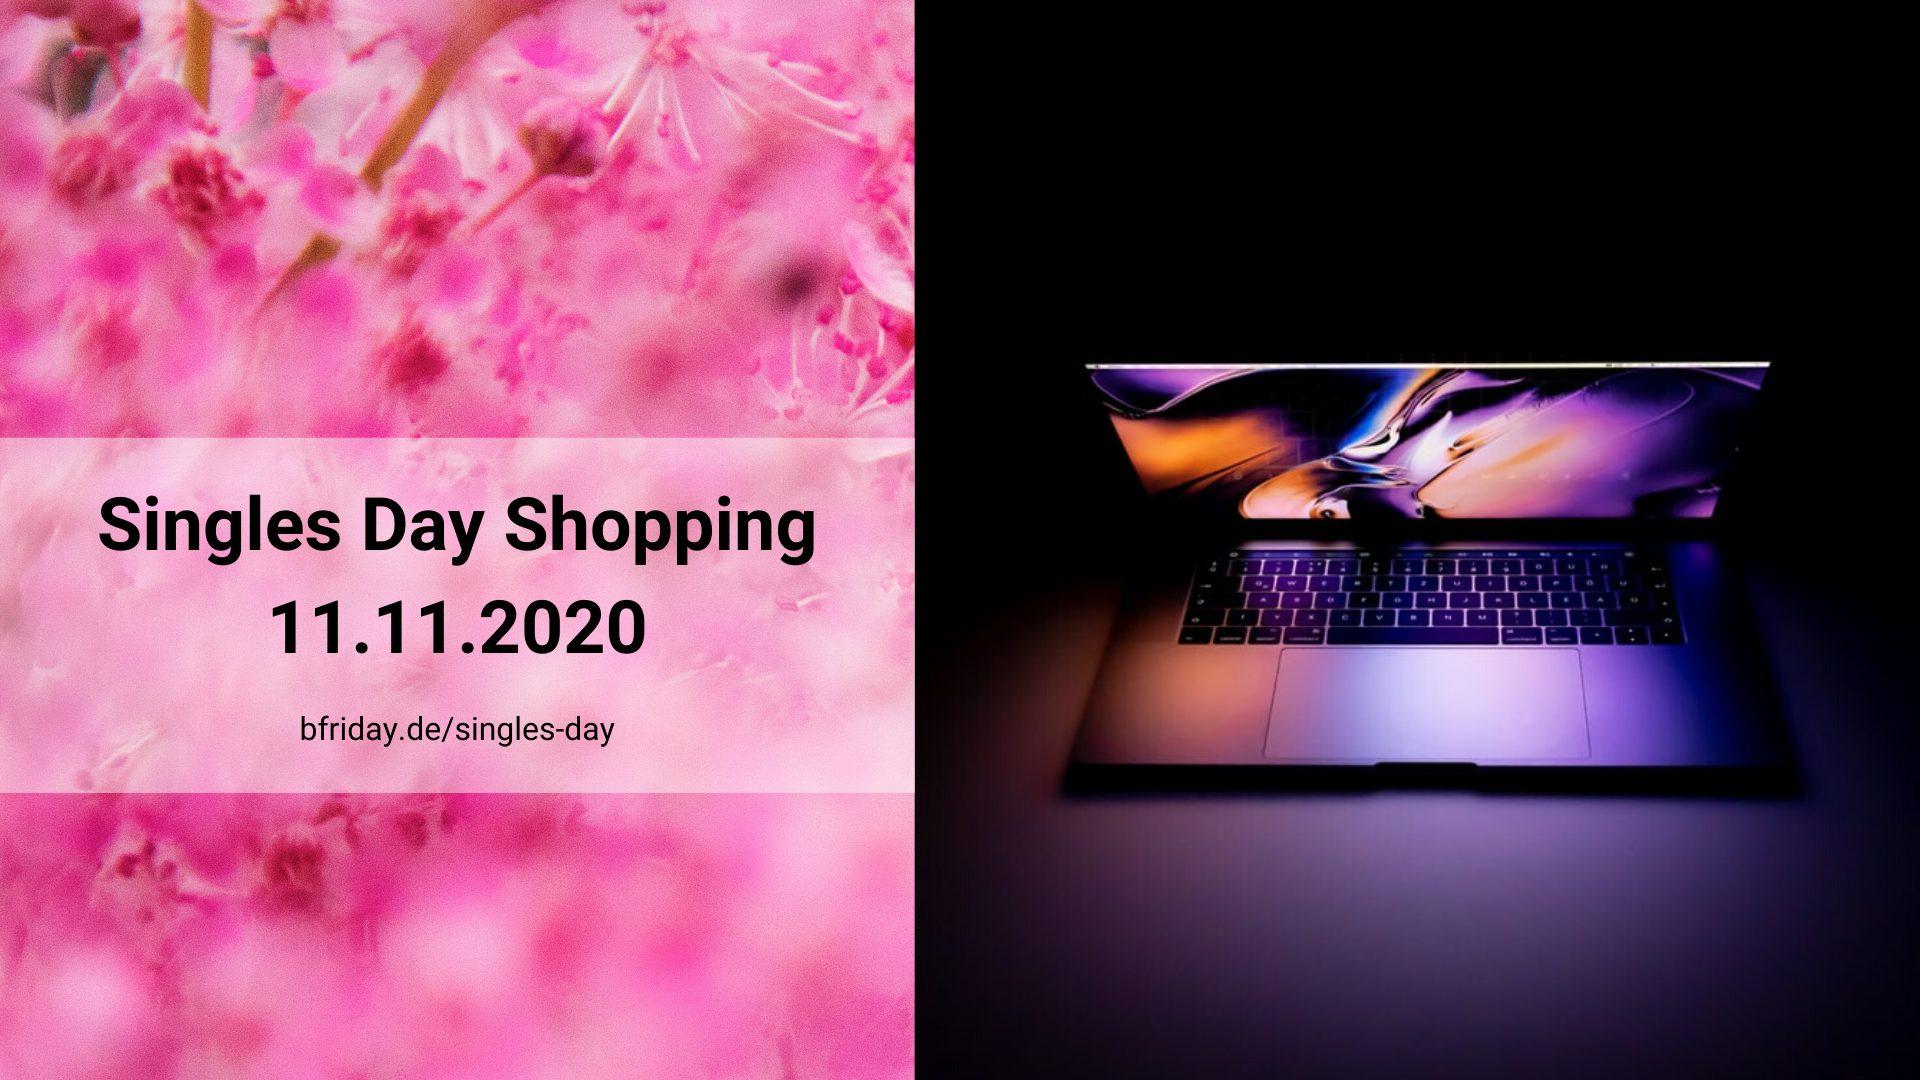 Singles Day Shopping 2020